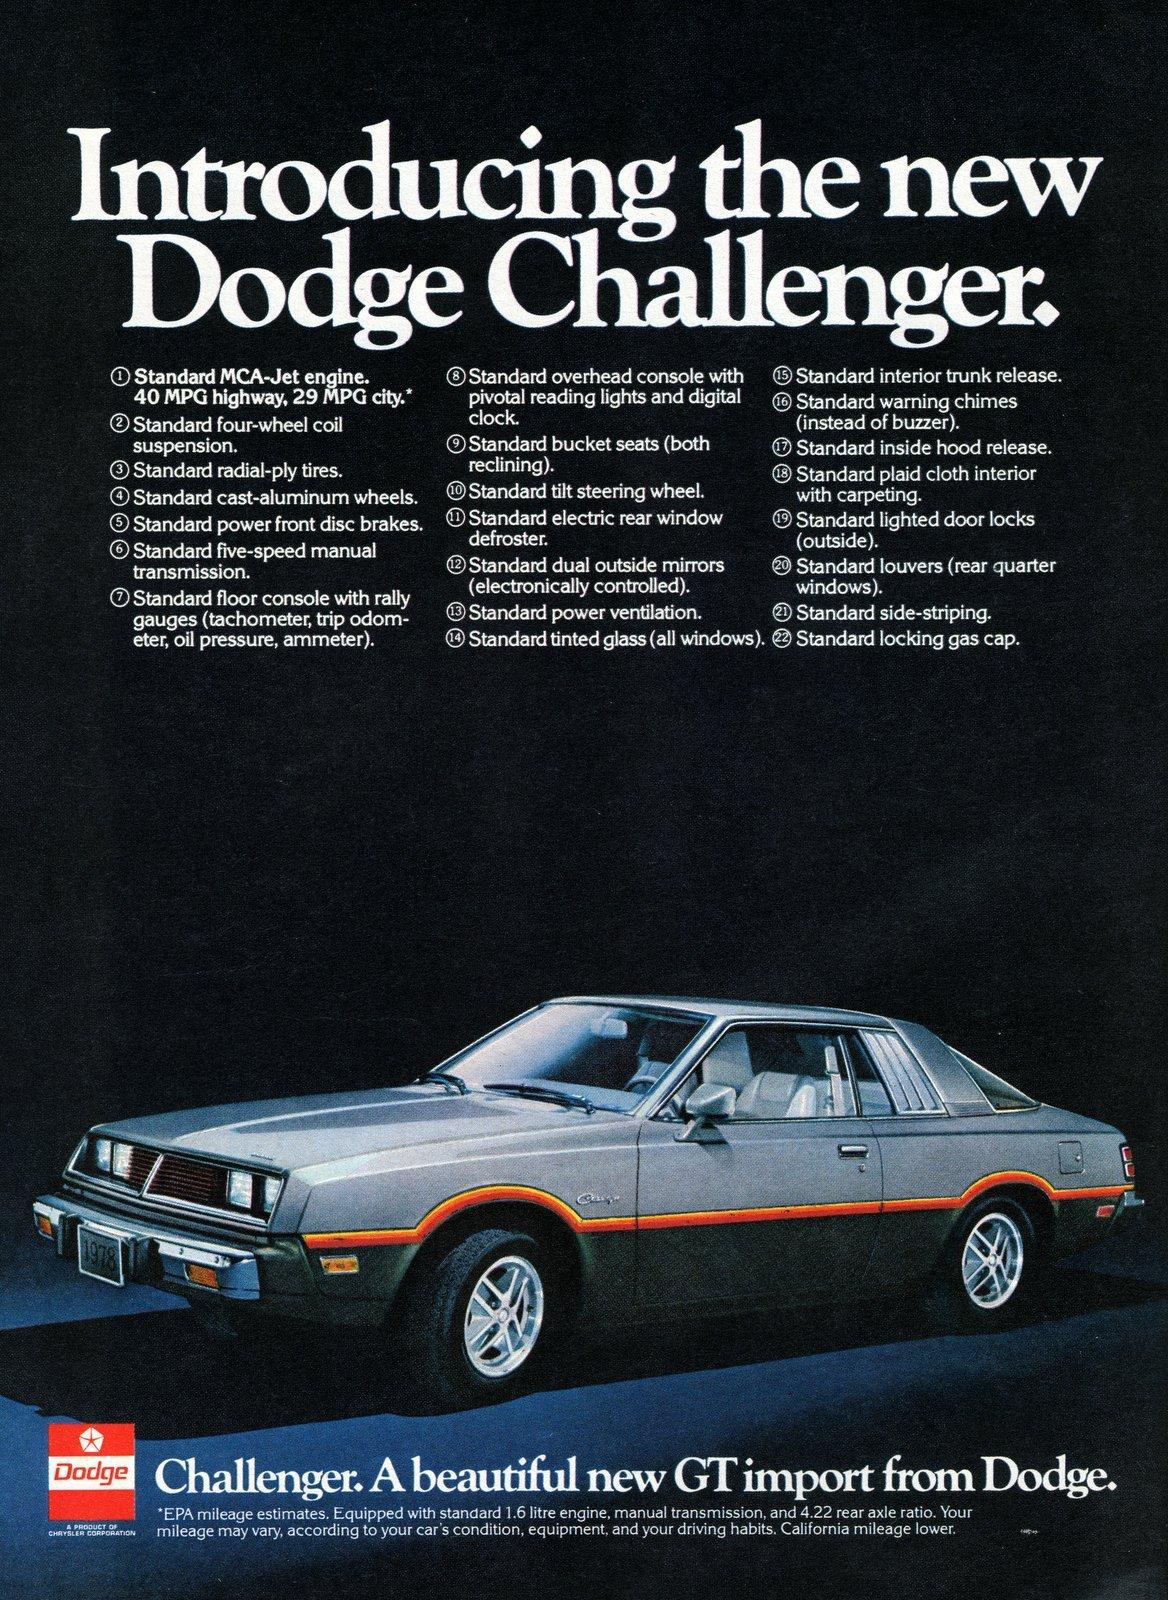 Second generation Dodge Challenger (1978)